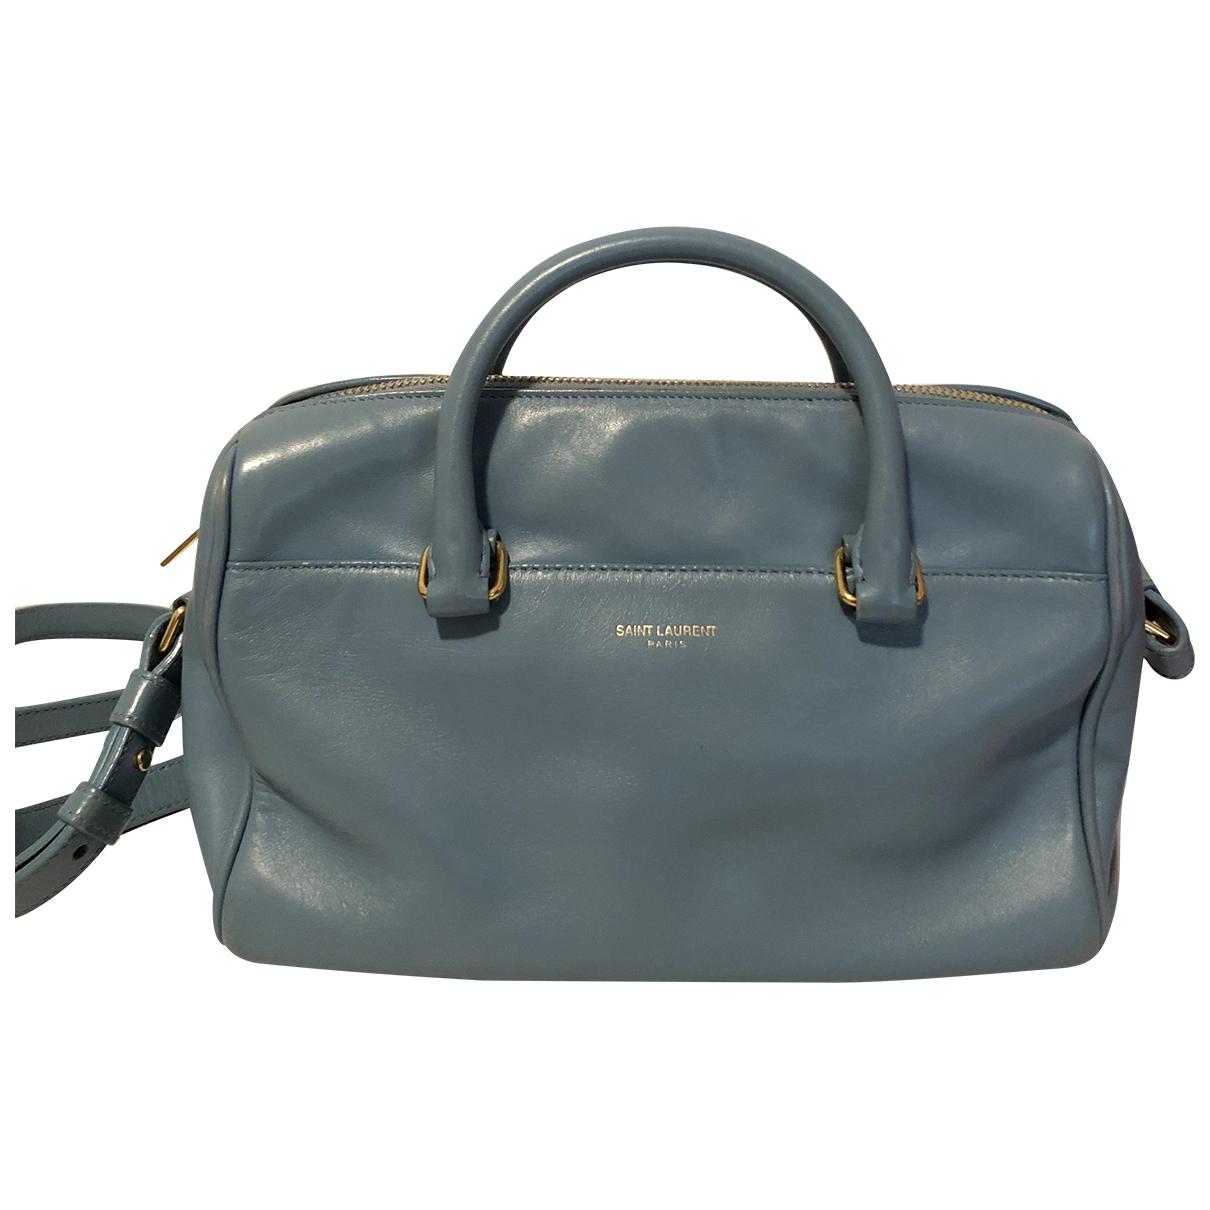 Saint Laurent Duffle Blue Leather handbag for Women N